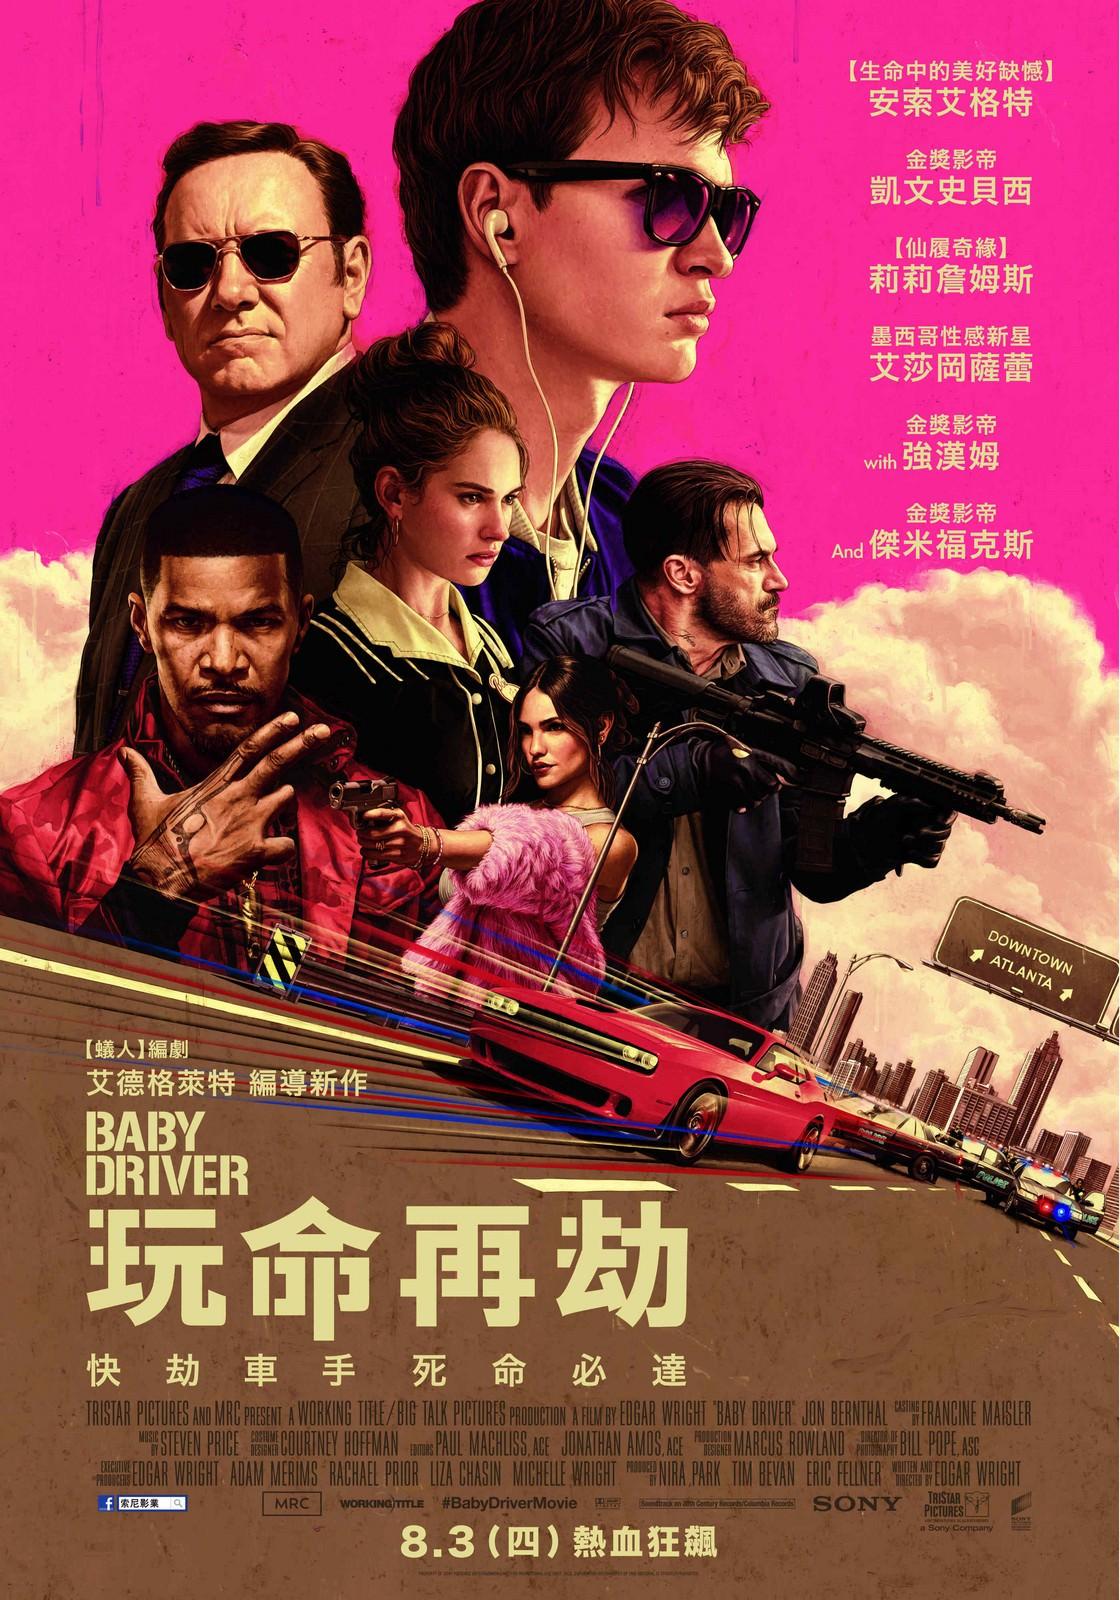 Movie, Baby Driver(美國, 2017年) / 玩命再劫(台灣) / 极盗车神(中國) / 寶貝車神(香港), 電影海報, 台灣